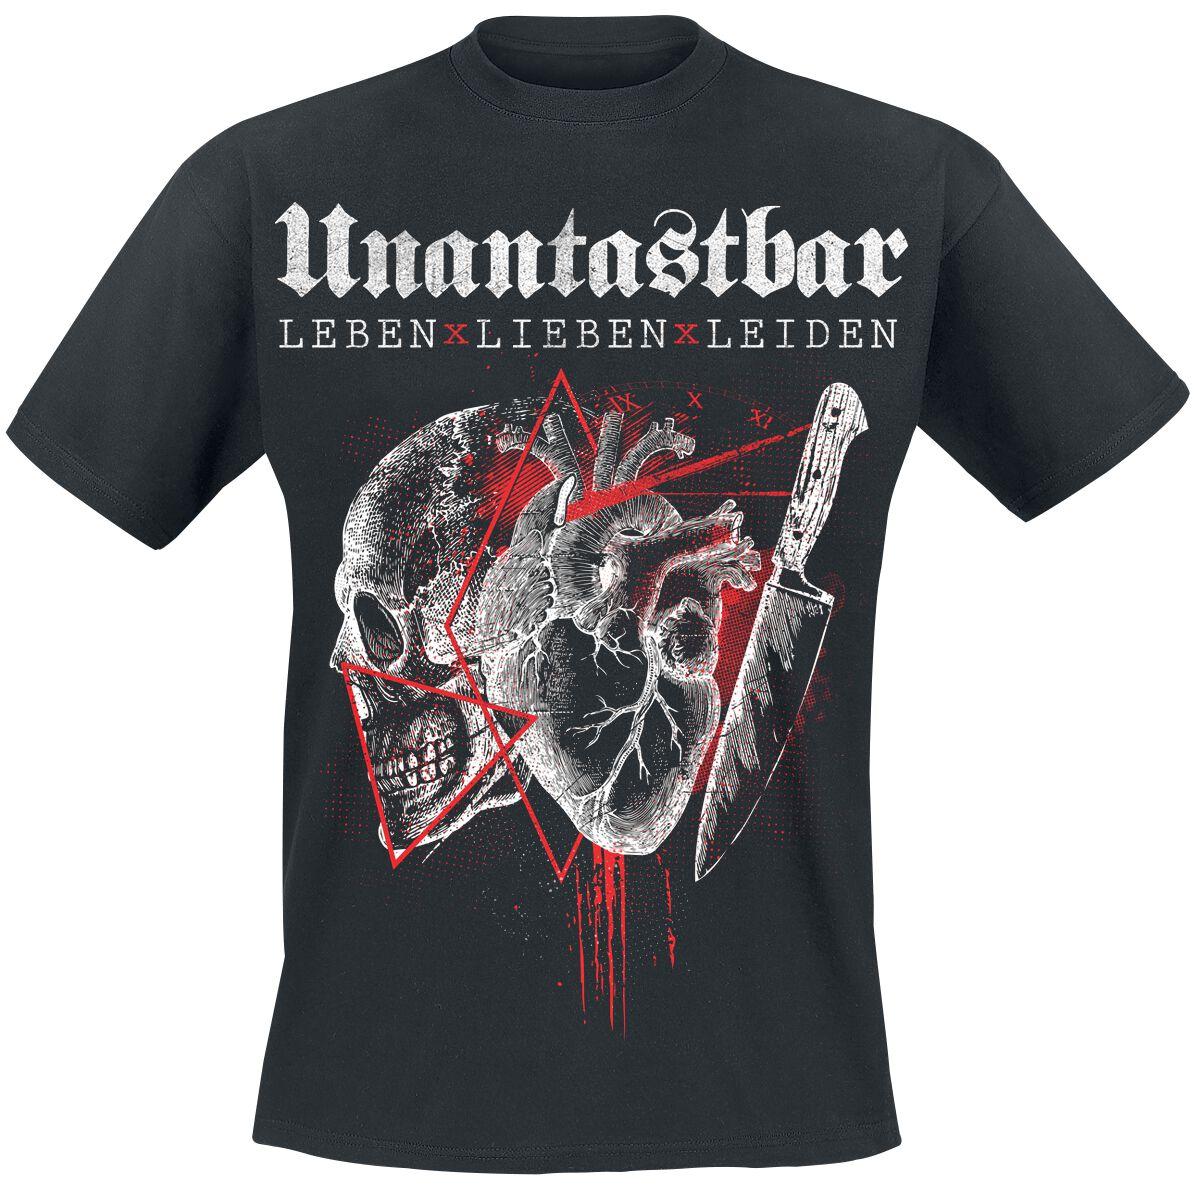 Unantastbar Leben, Lieben, Leiden T-Shirt schwarz